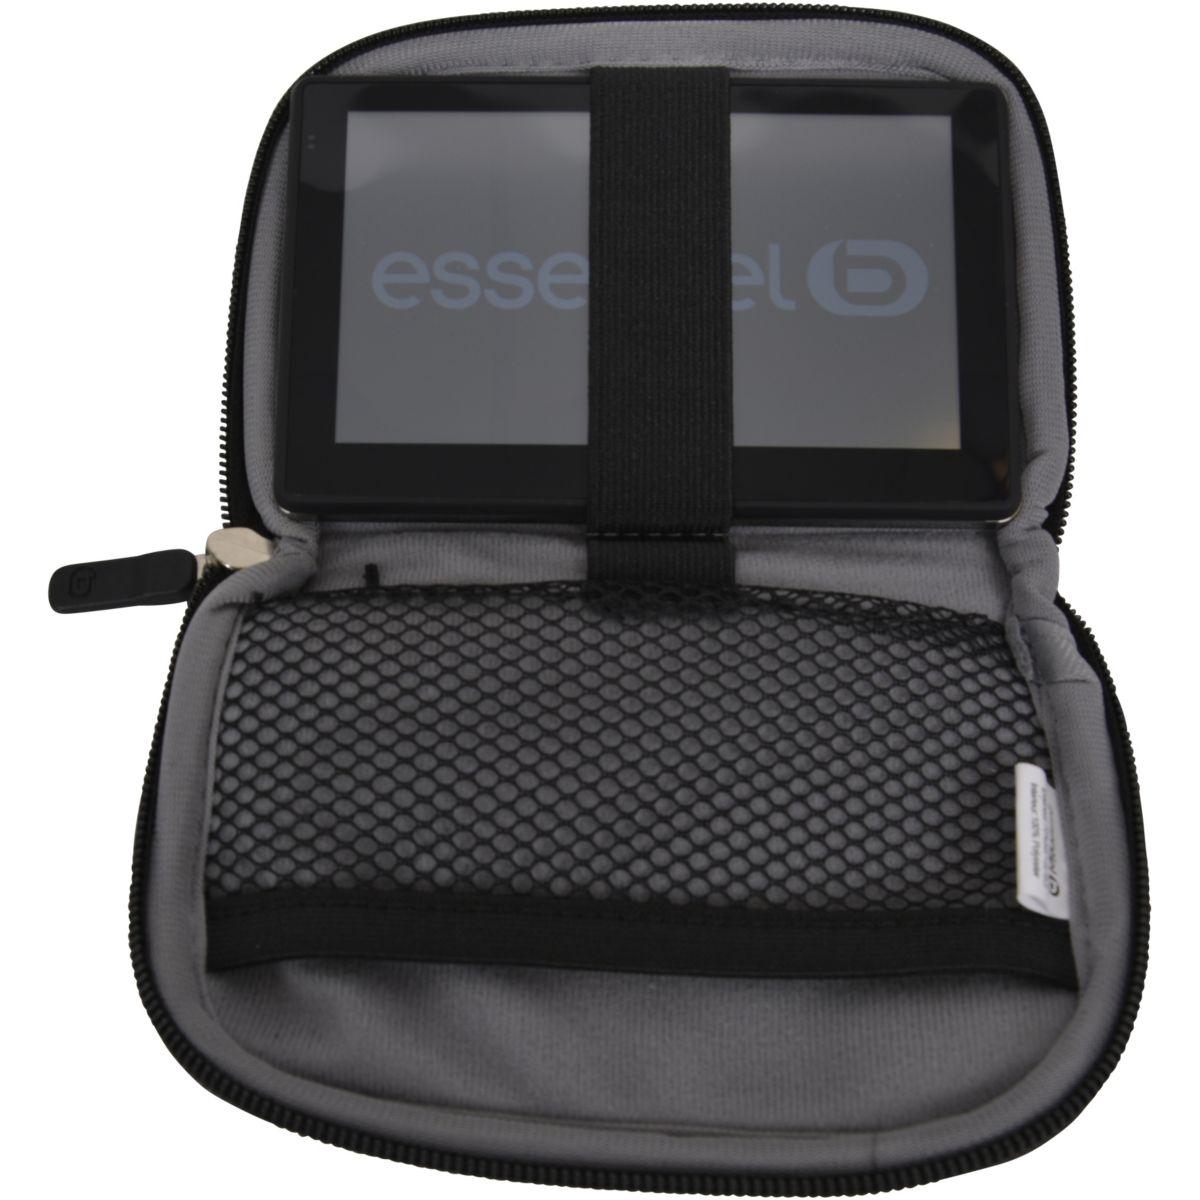 Housse sc navigo t2 4,3'' noir - produit coup de coeur webdistrib.com ! (photo)